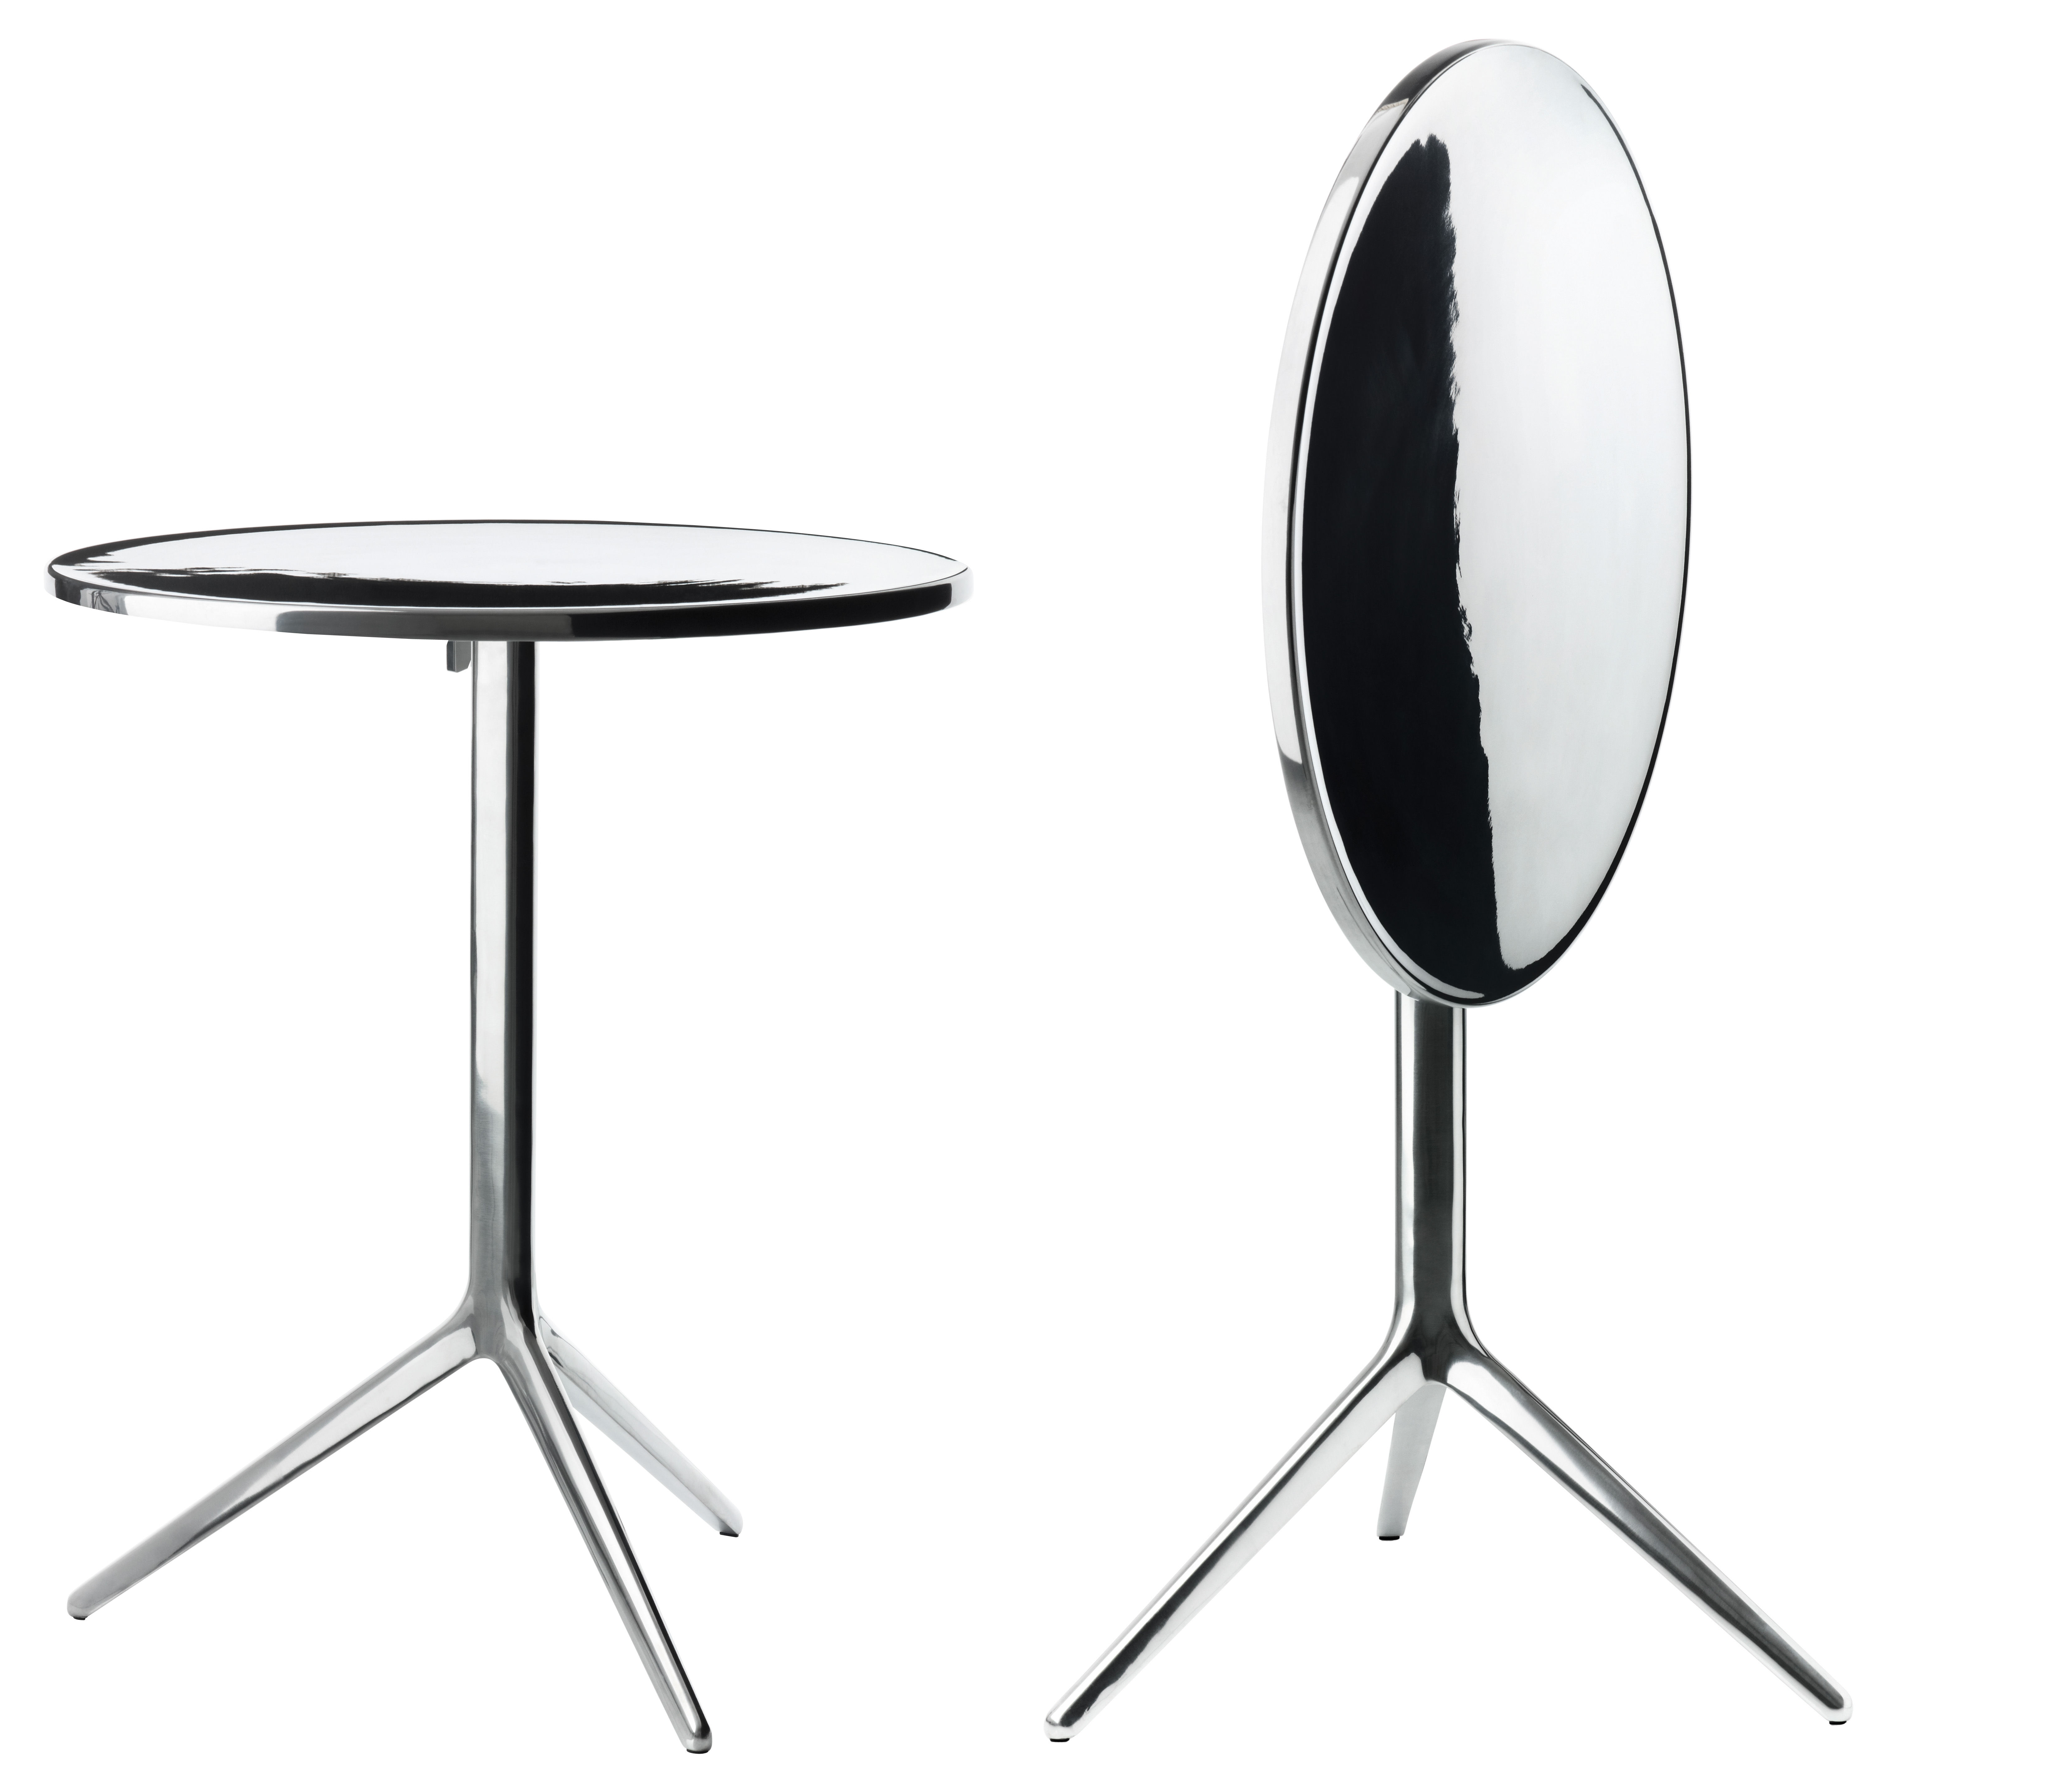 aktion - Style industriel - Central Klapptisch H 72 cm x Ø 60 cm - Ausführung Aluminium poliert - Magis - Aluminium poliert - poliertes Aluminium